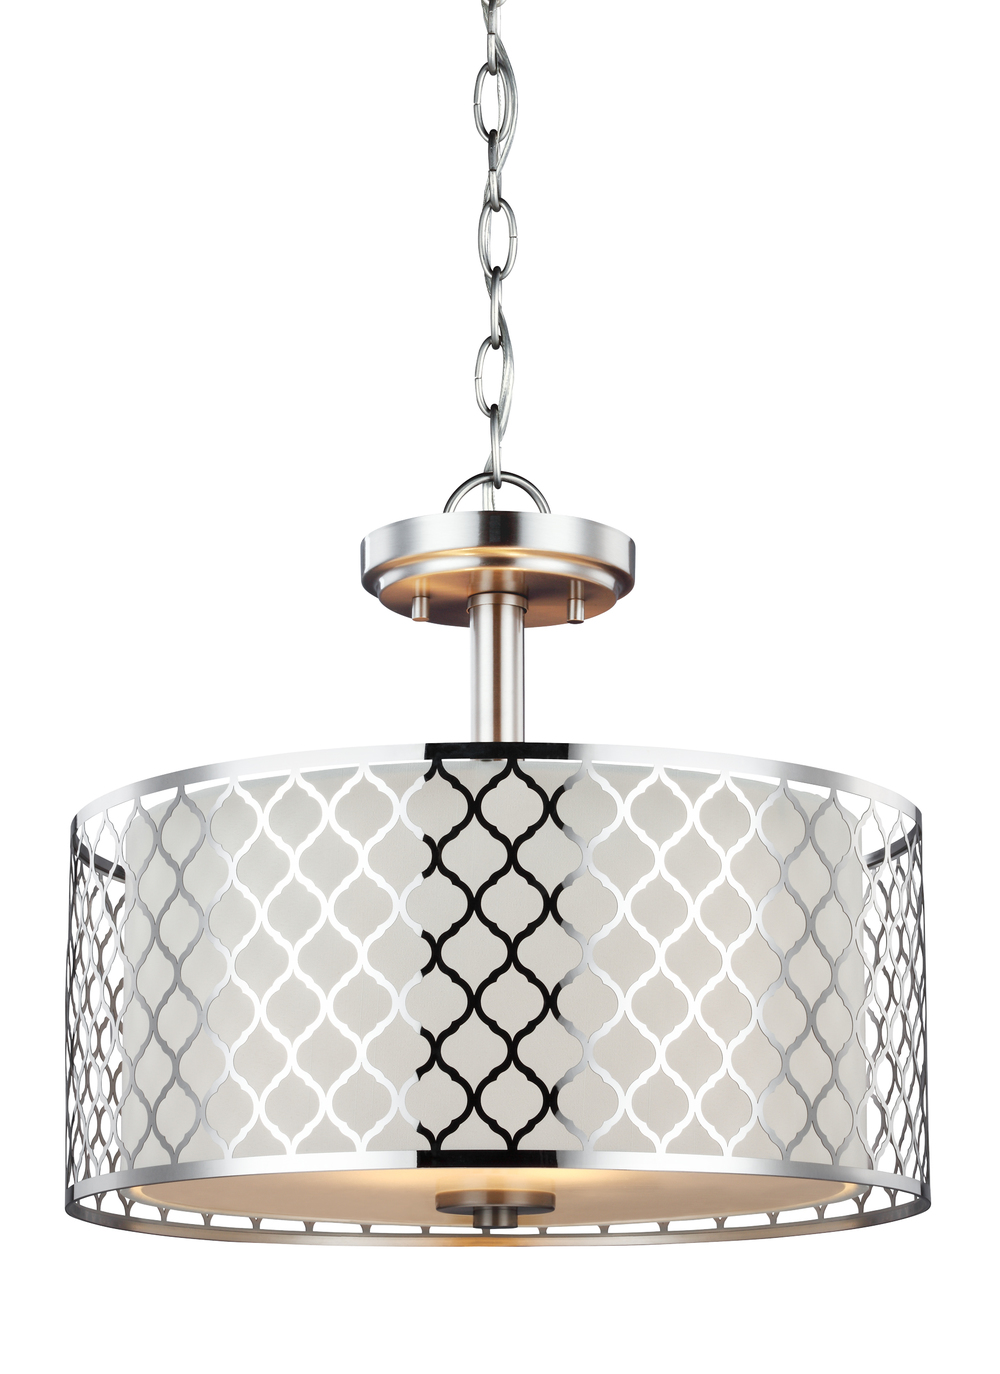 Sea Gull Lighting - Two Light Semi-Flush Convertible Pendant